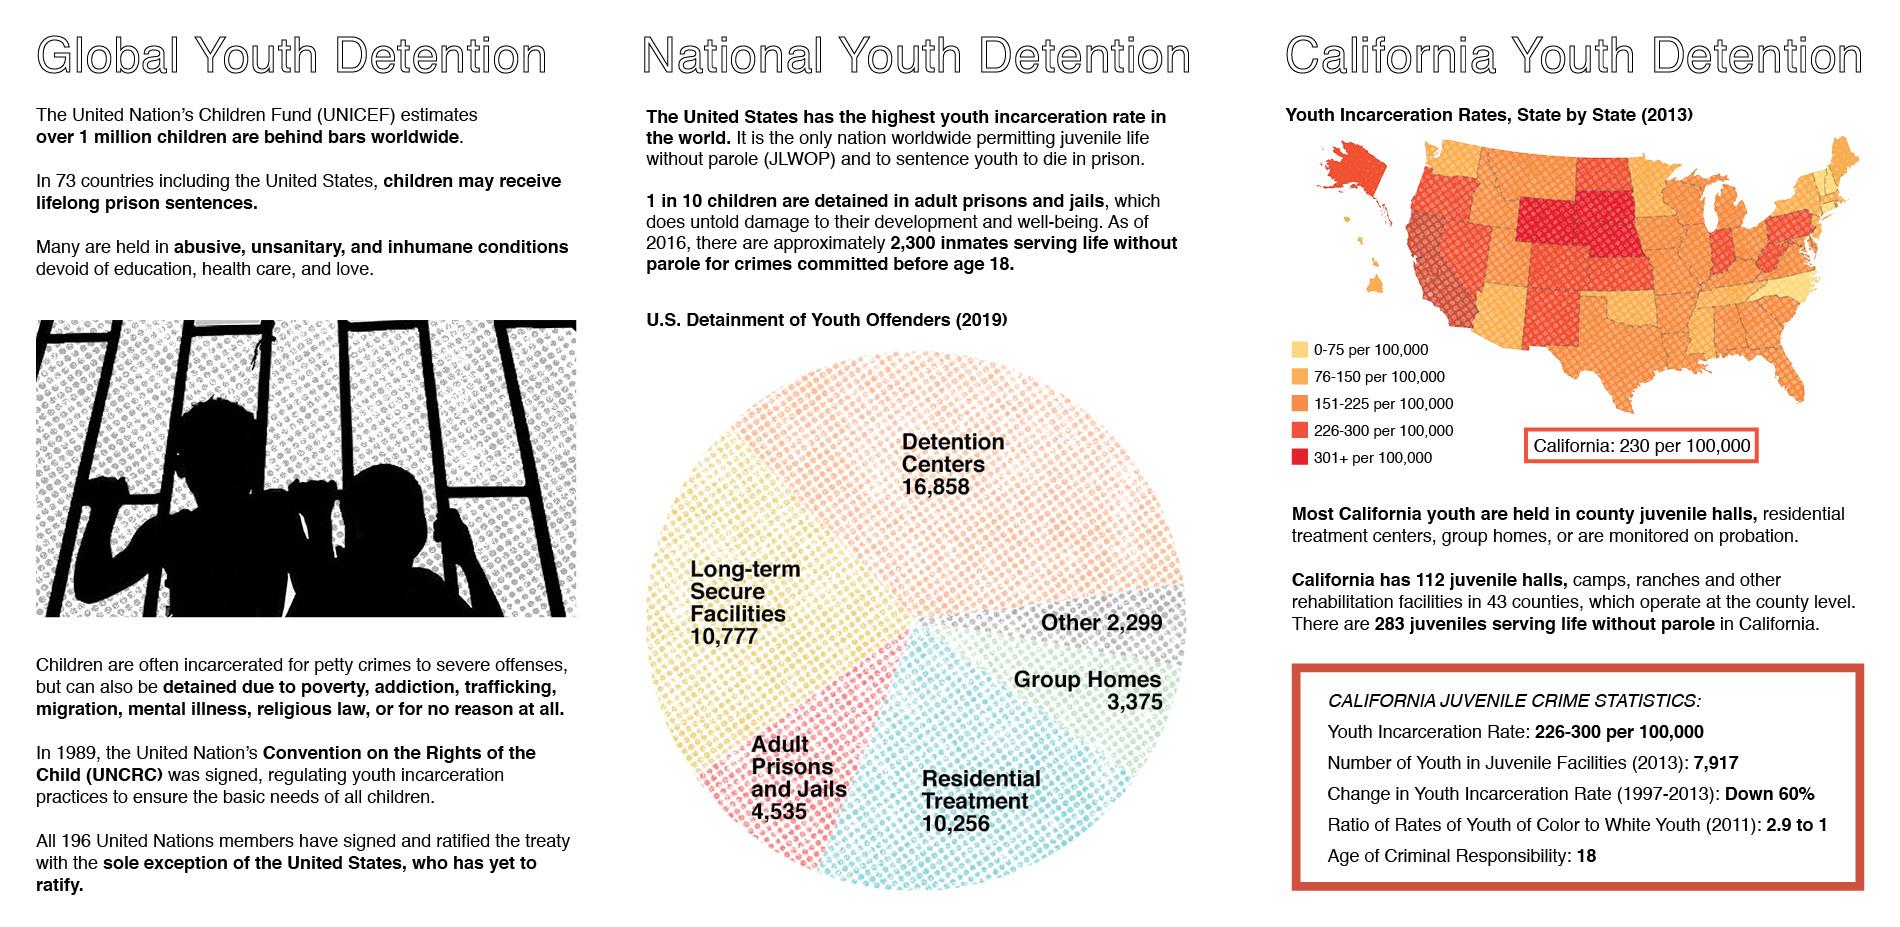 Juvenile Justice Statistics